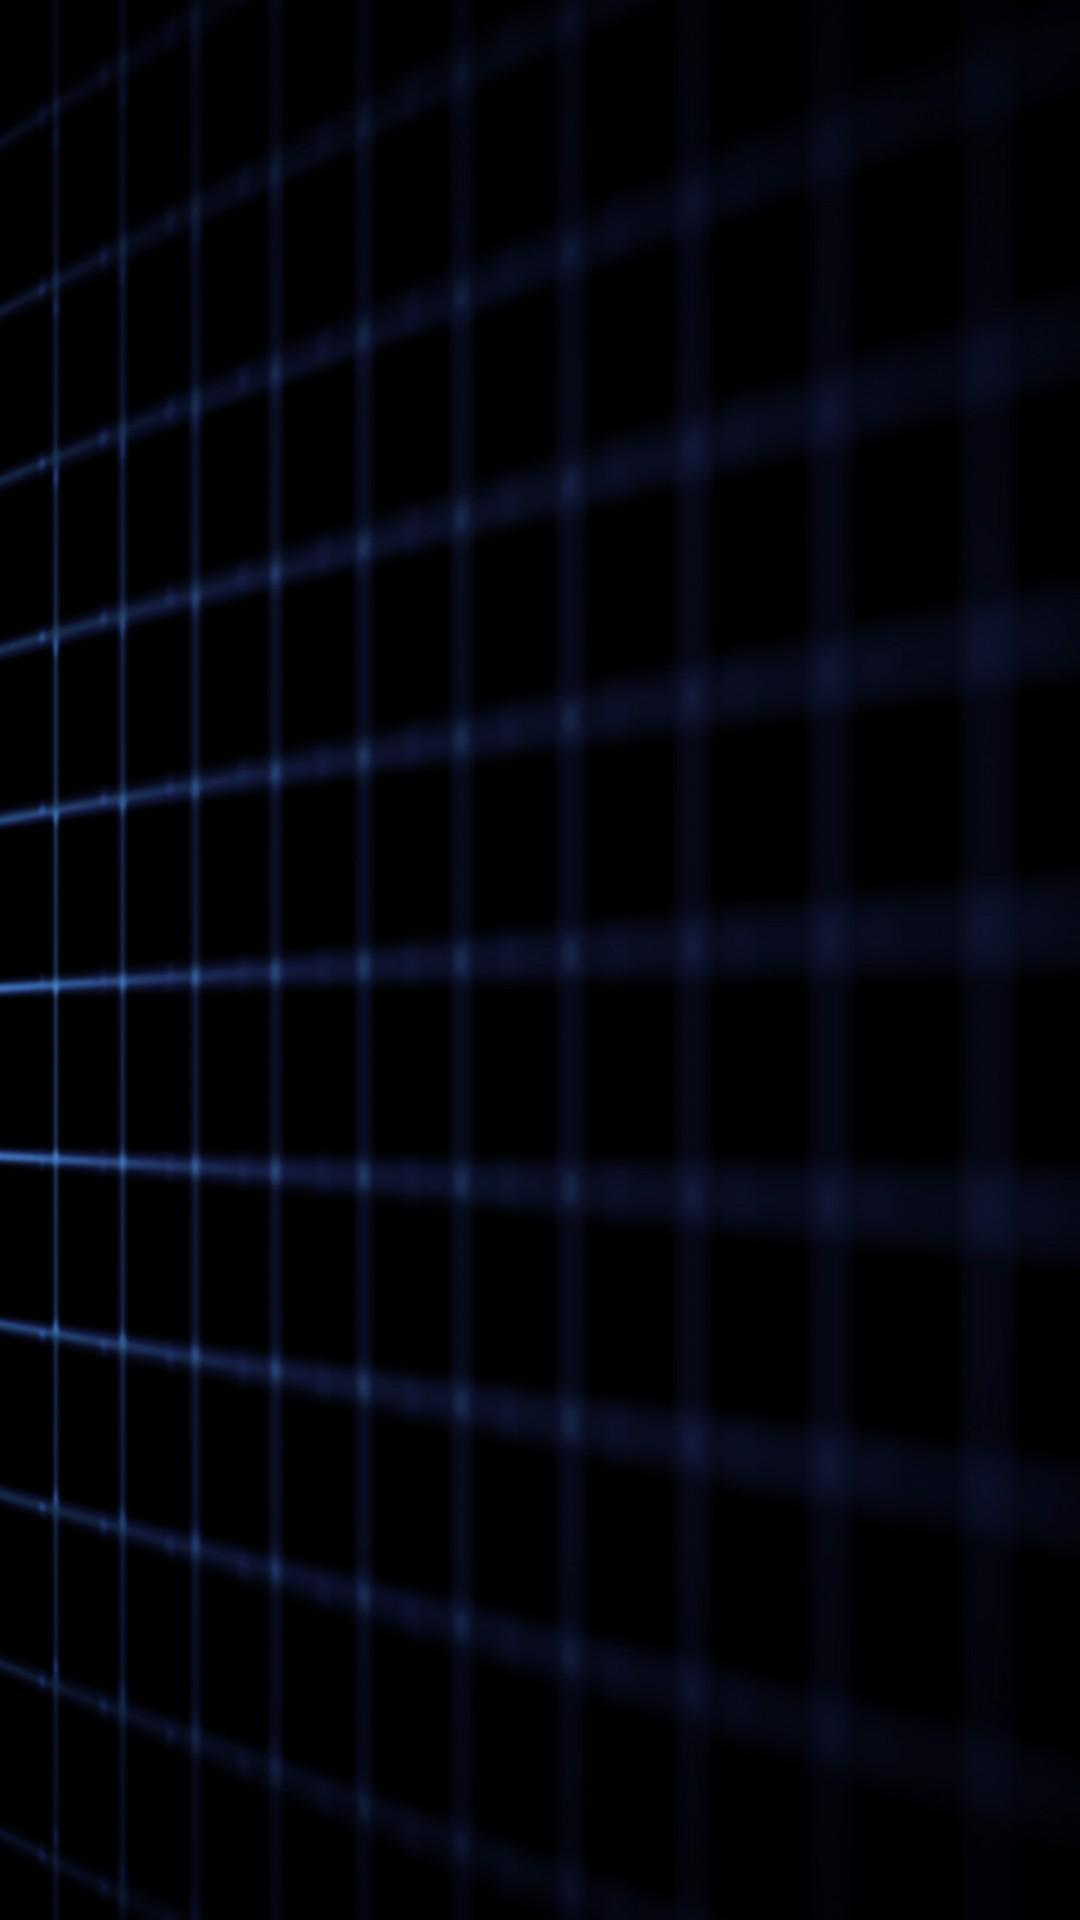 Wallpaper Lines Grid Black 4k Abstract 15168